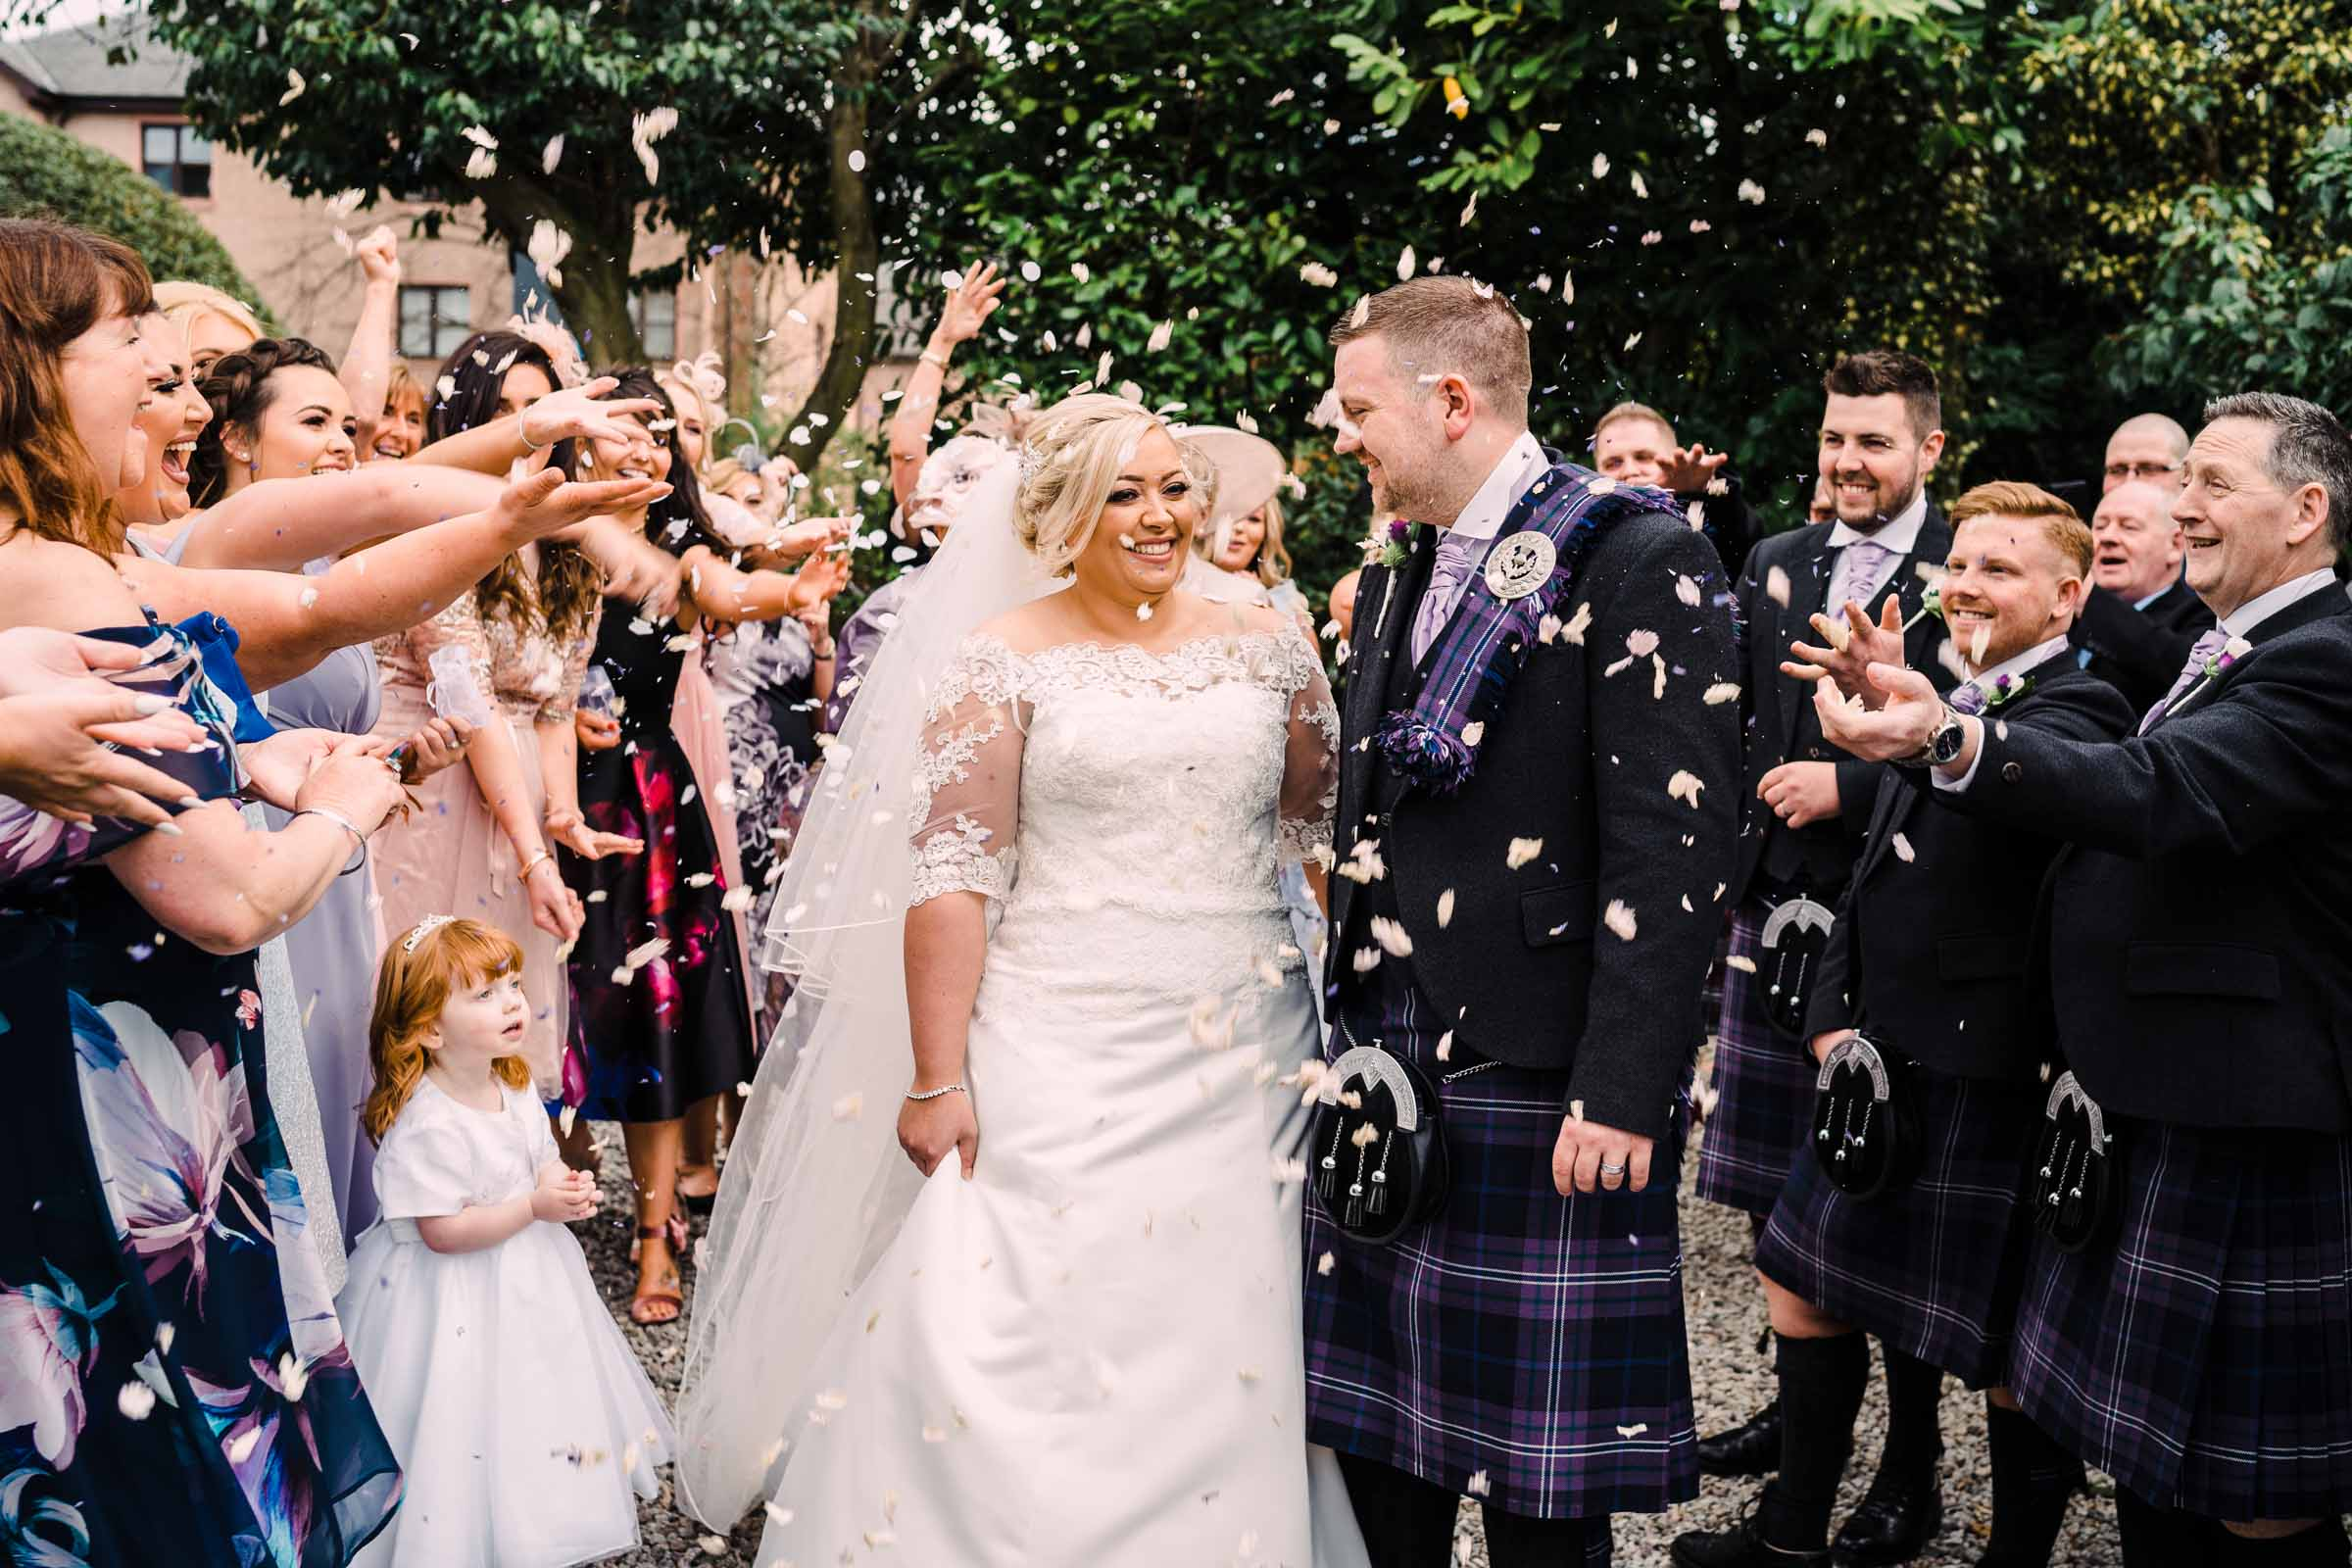 motherwell-moorings-wedding-photographer-dearlyphotography (55 of 77).jpg